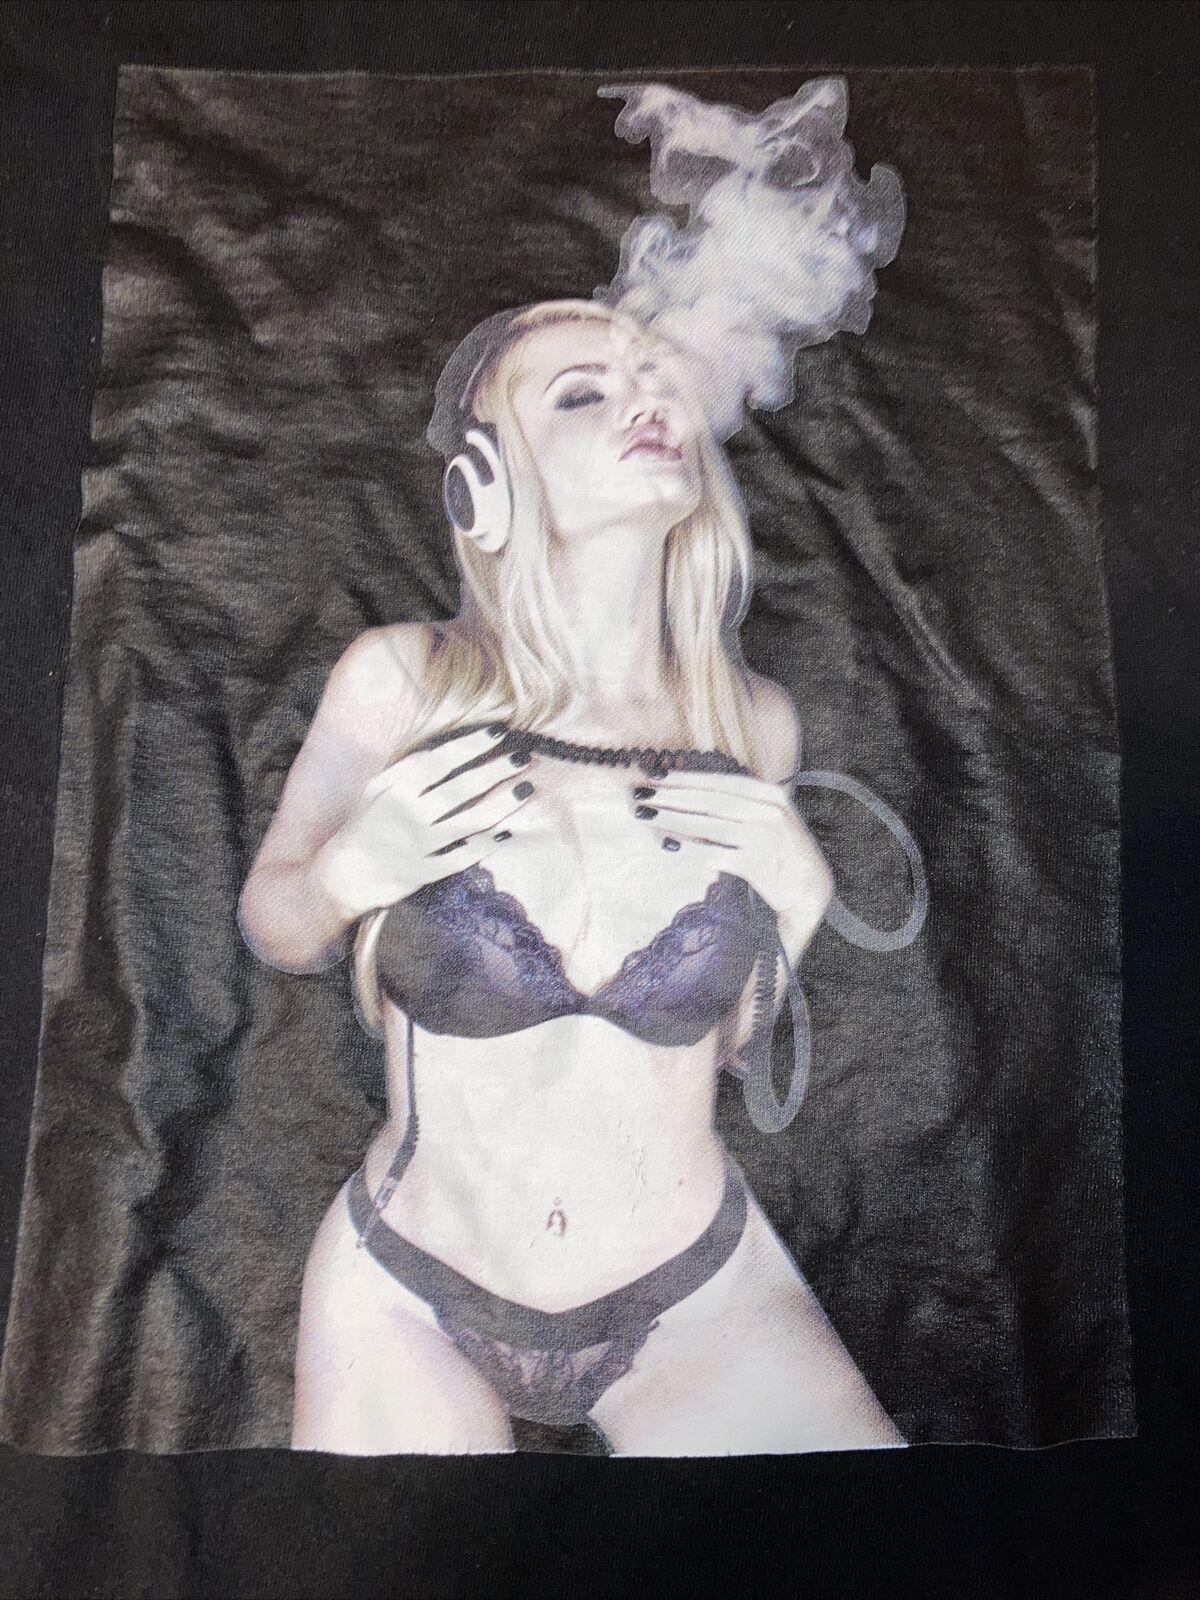 Sexy T Shirt 3xl Vape Madonna Britney - image 3